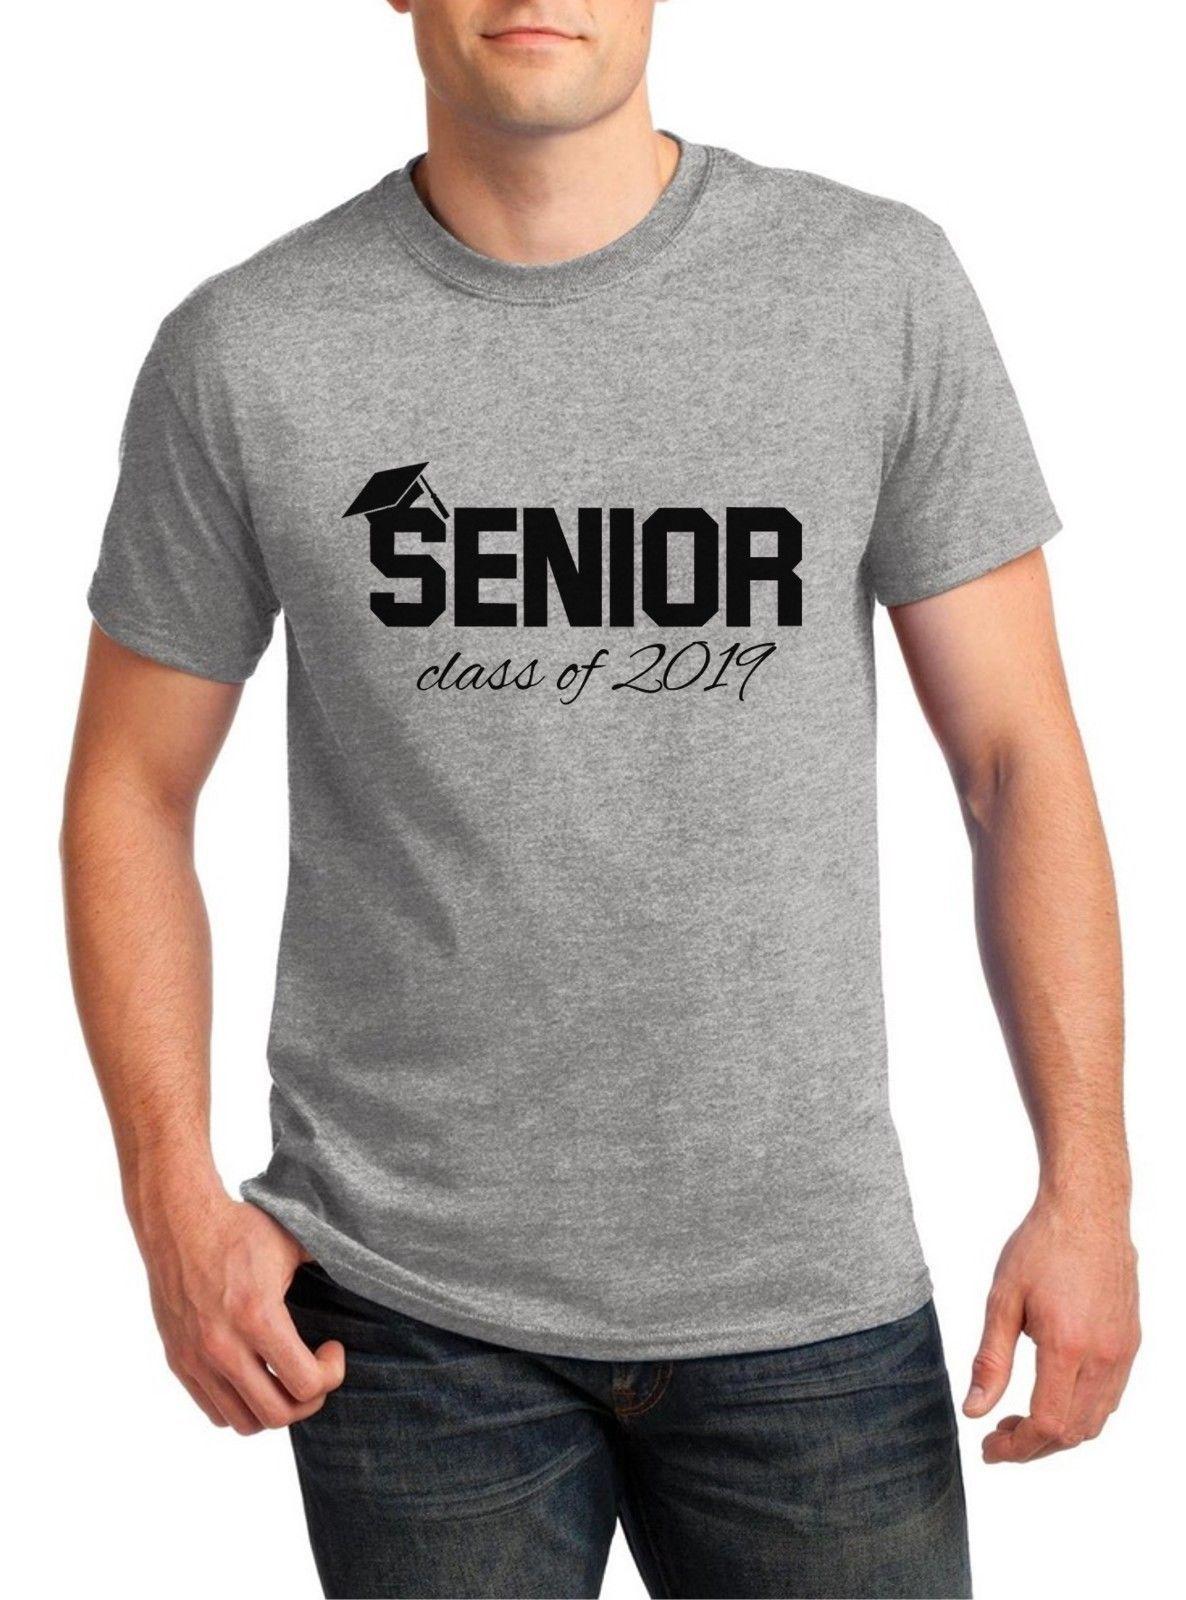 df5a2e974 Compre Hombres De Clase Superior De 2019 Camisa De Regreso A La Escuela  Camiseta Duodécimo Grado 12 TeeFunny Envío Gratis Unisex Casual Camiseta  Regalo A ...